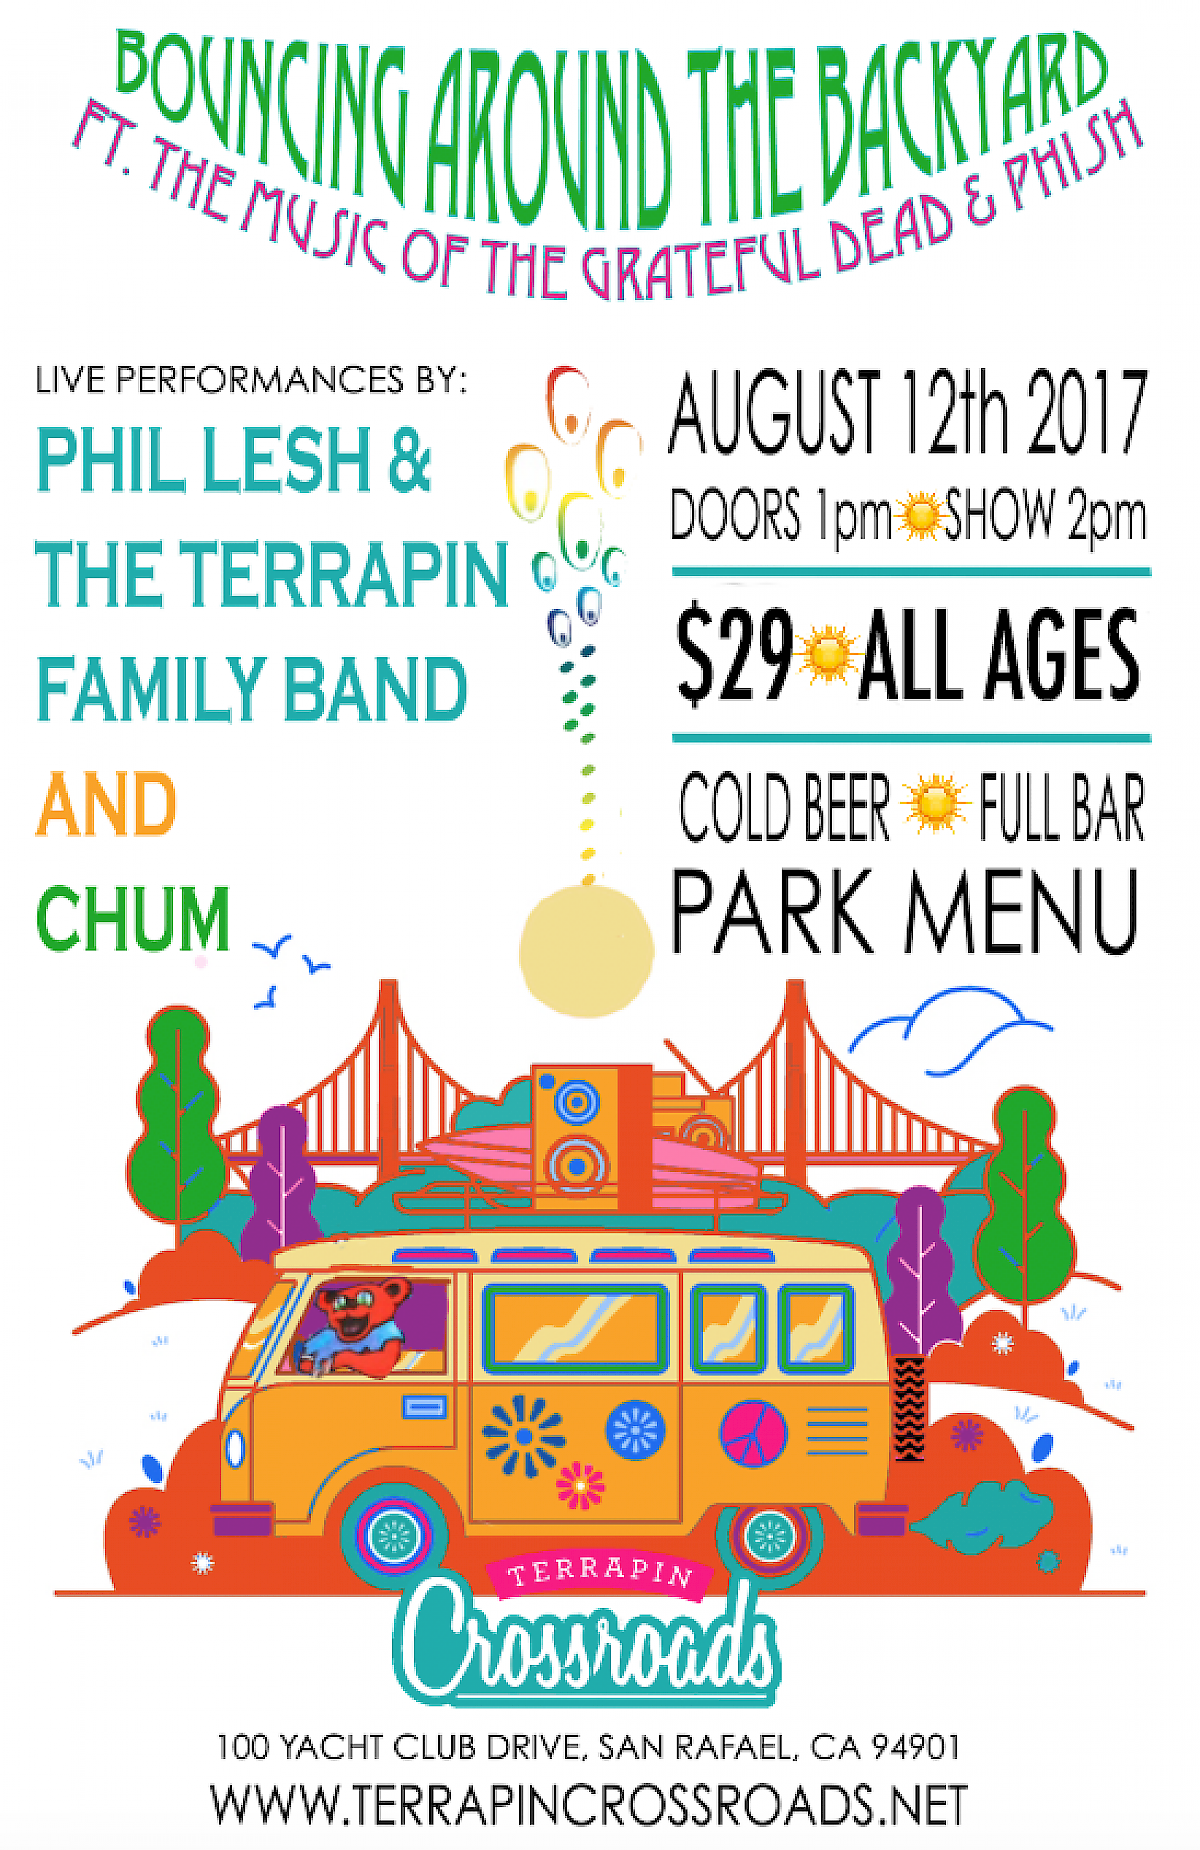 terrapin crossroads bouncing around the backyard august 2017